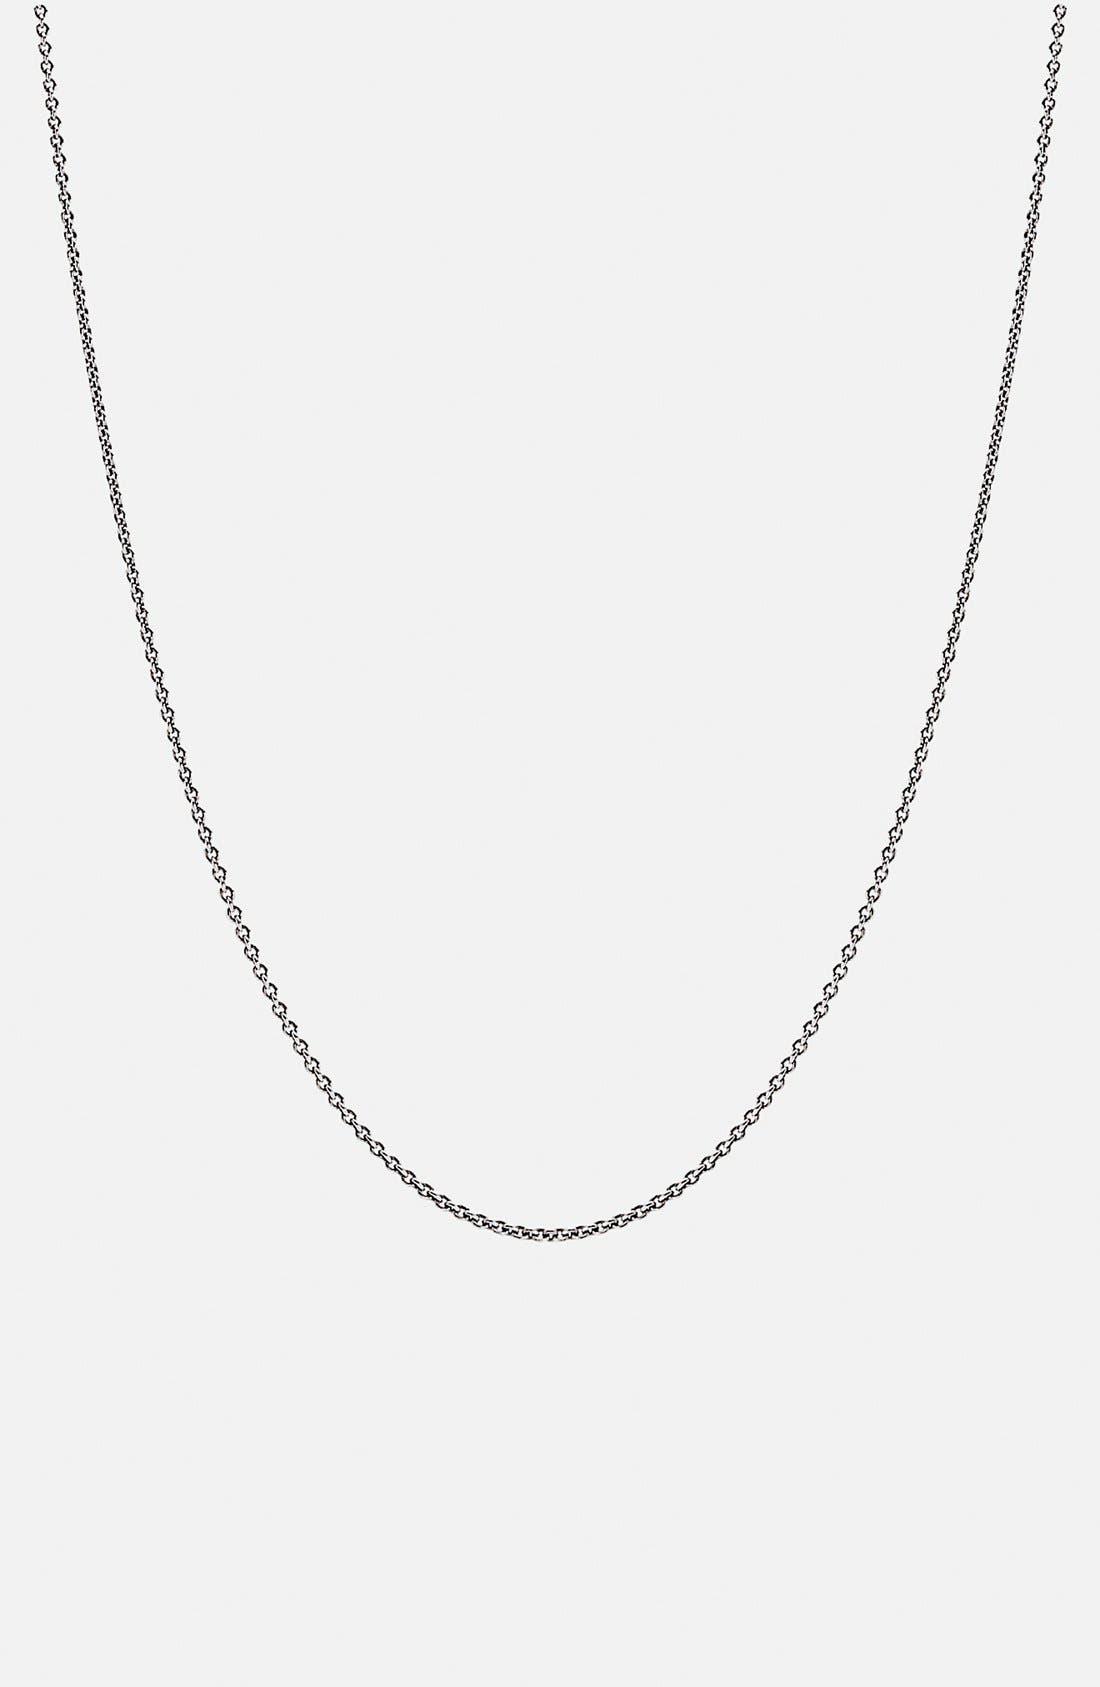 Alternate Image 1 Selected - PANDORA Link Necklace